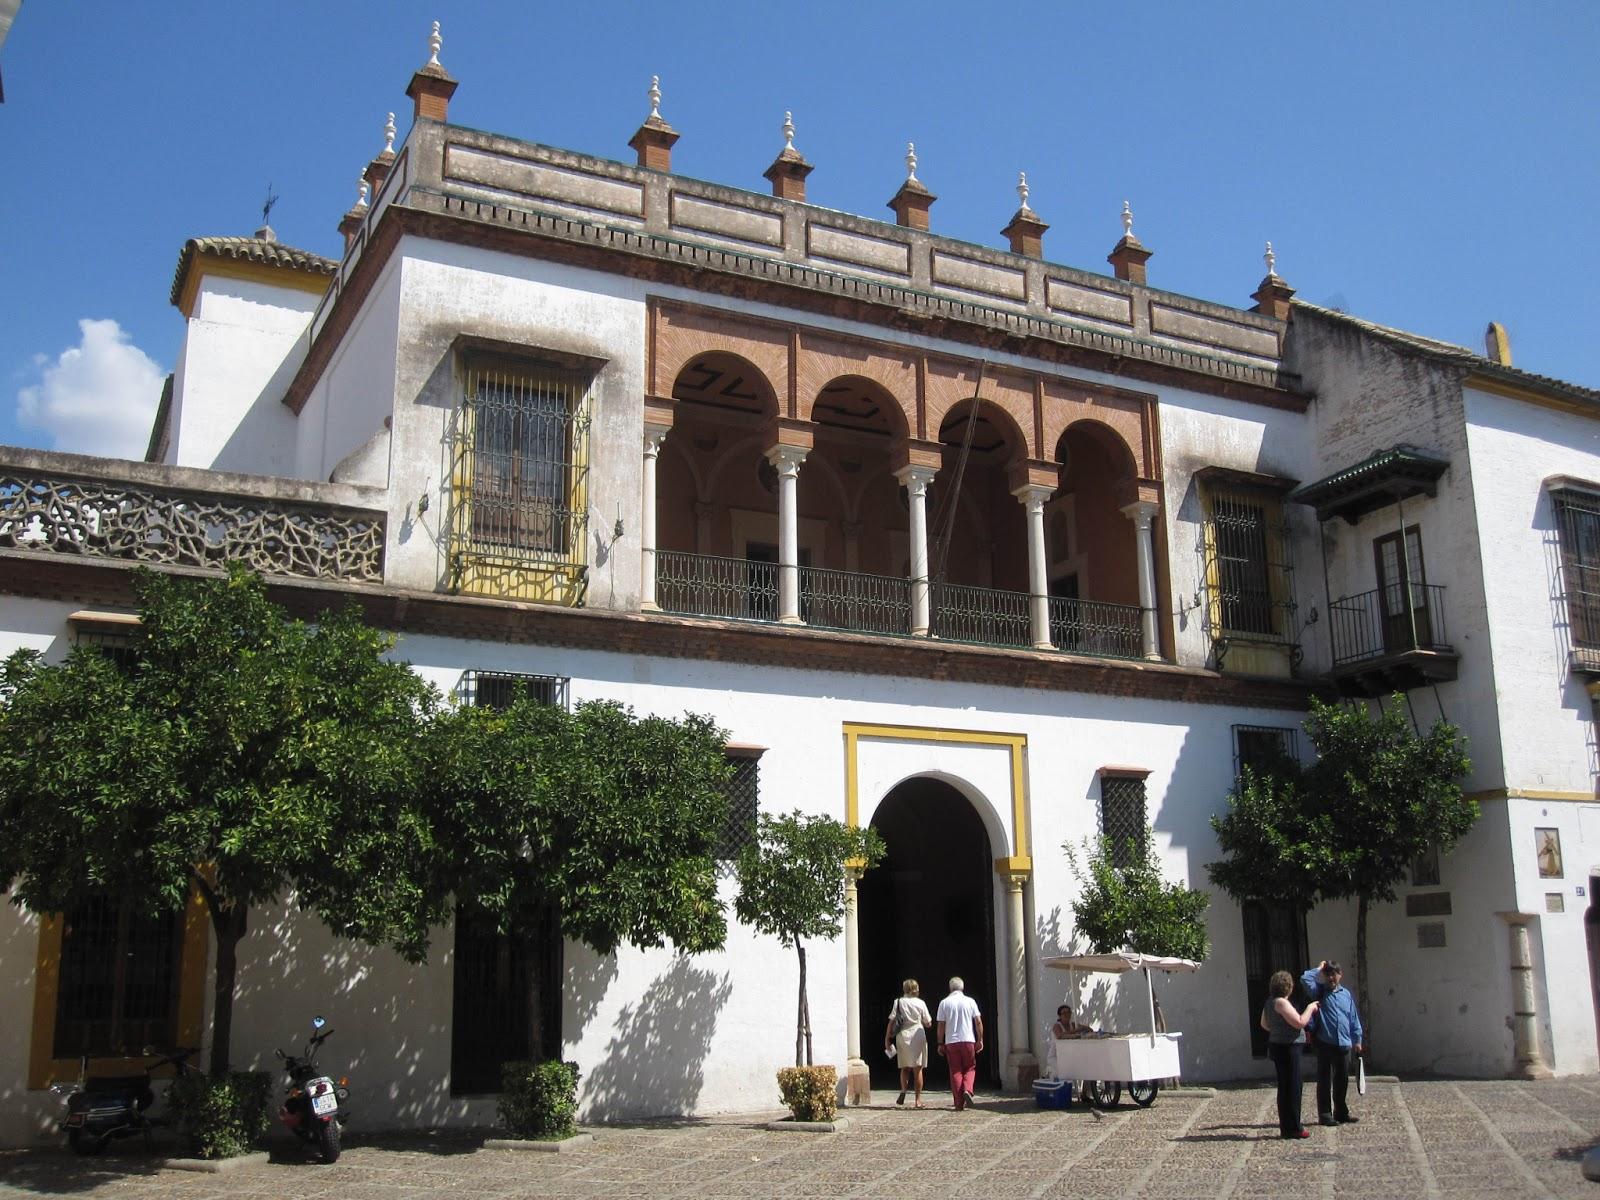 Seville Casa de Pilatos